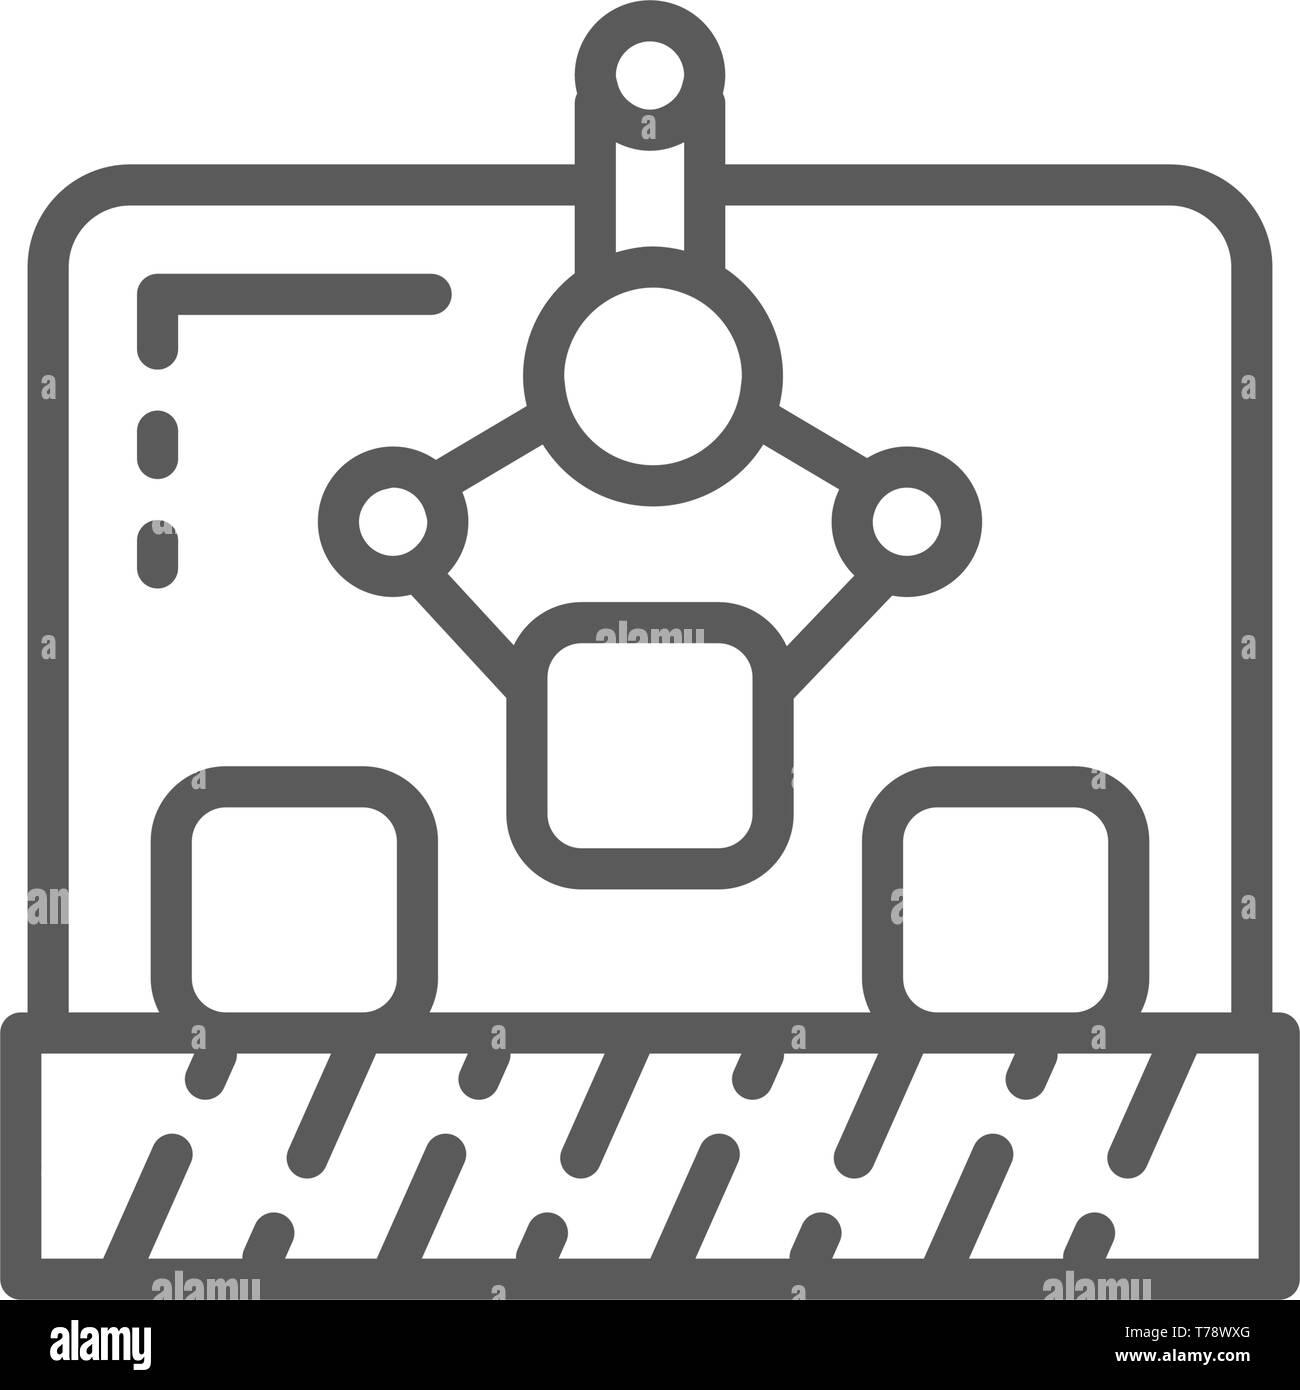 Robotic manipulator on conveyor, production line icon. - Stock Image